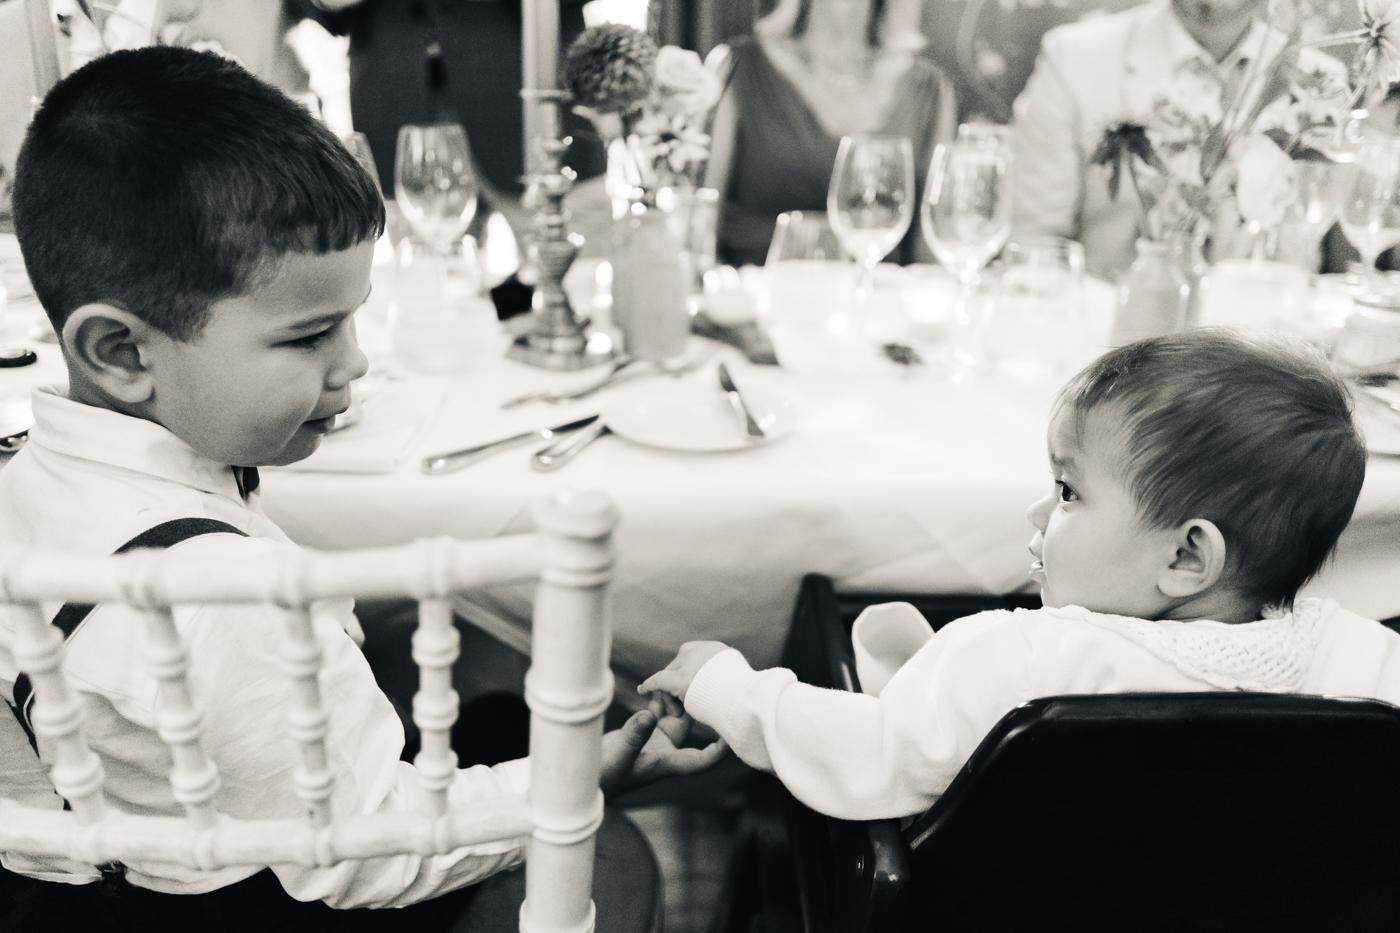 wedding-at-the-pheasant-harome-helmsley-north-yorkshire-wedding-photographer-0040.jpg